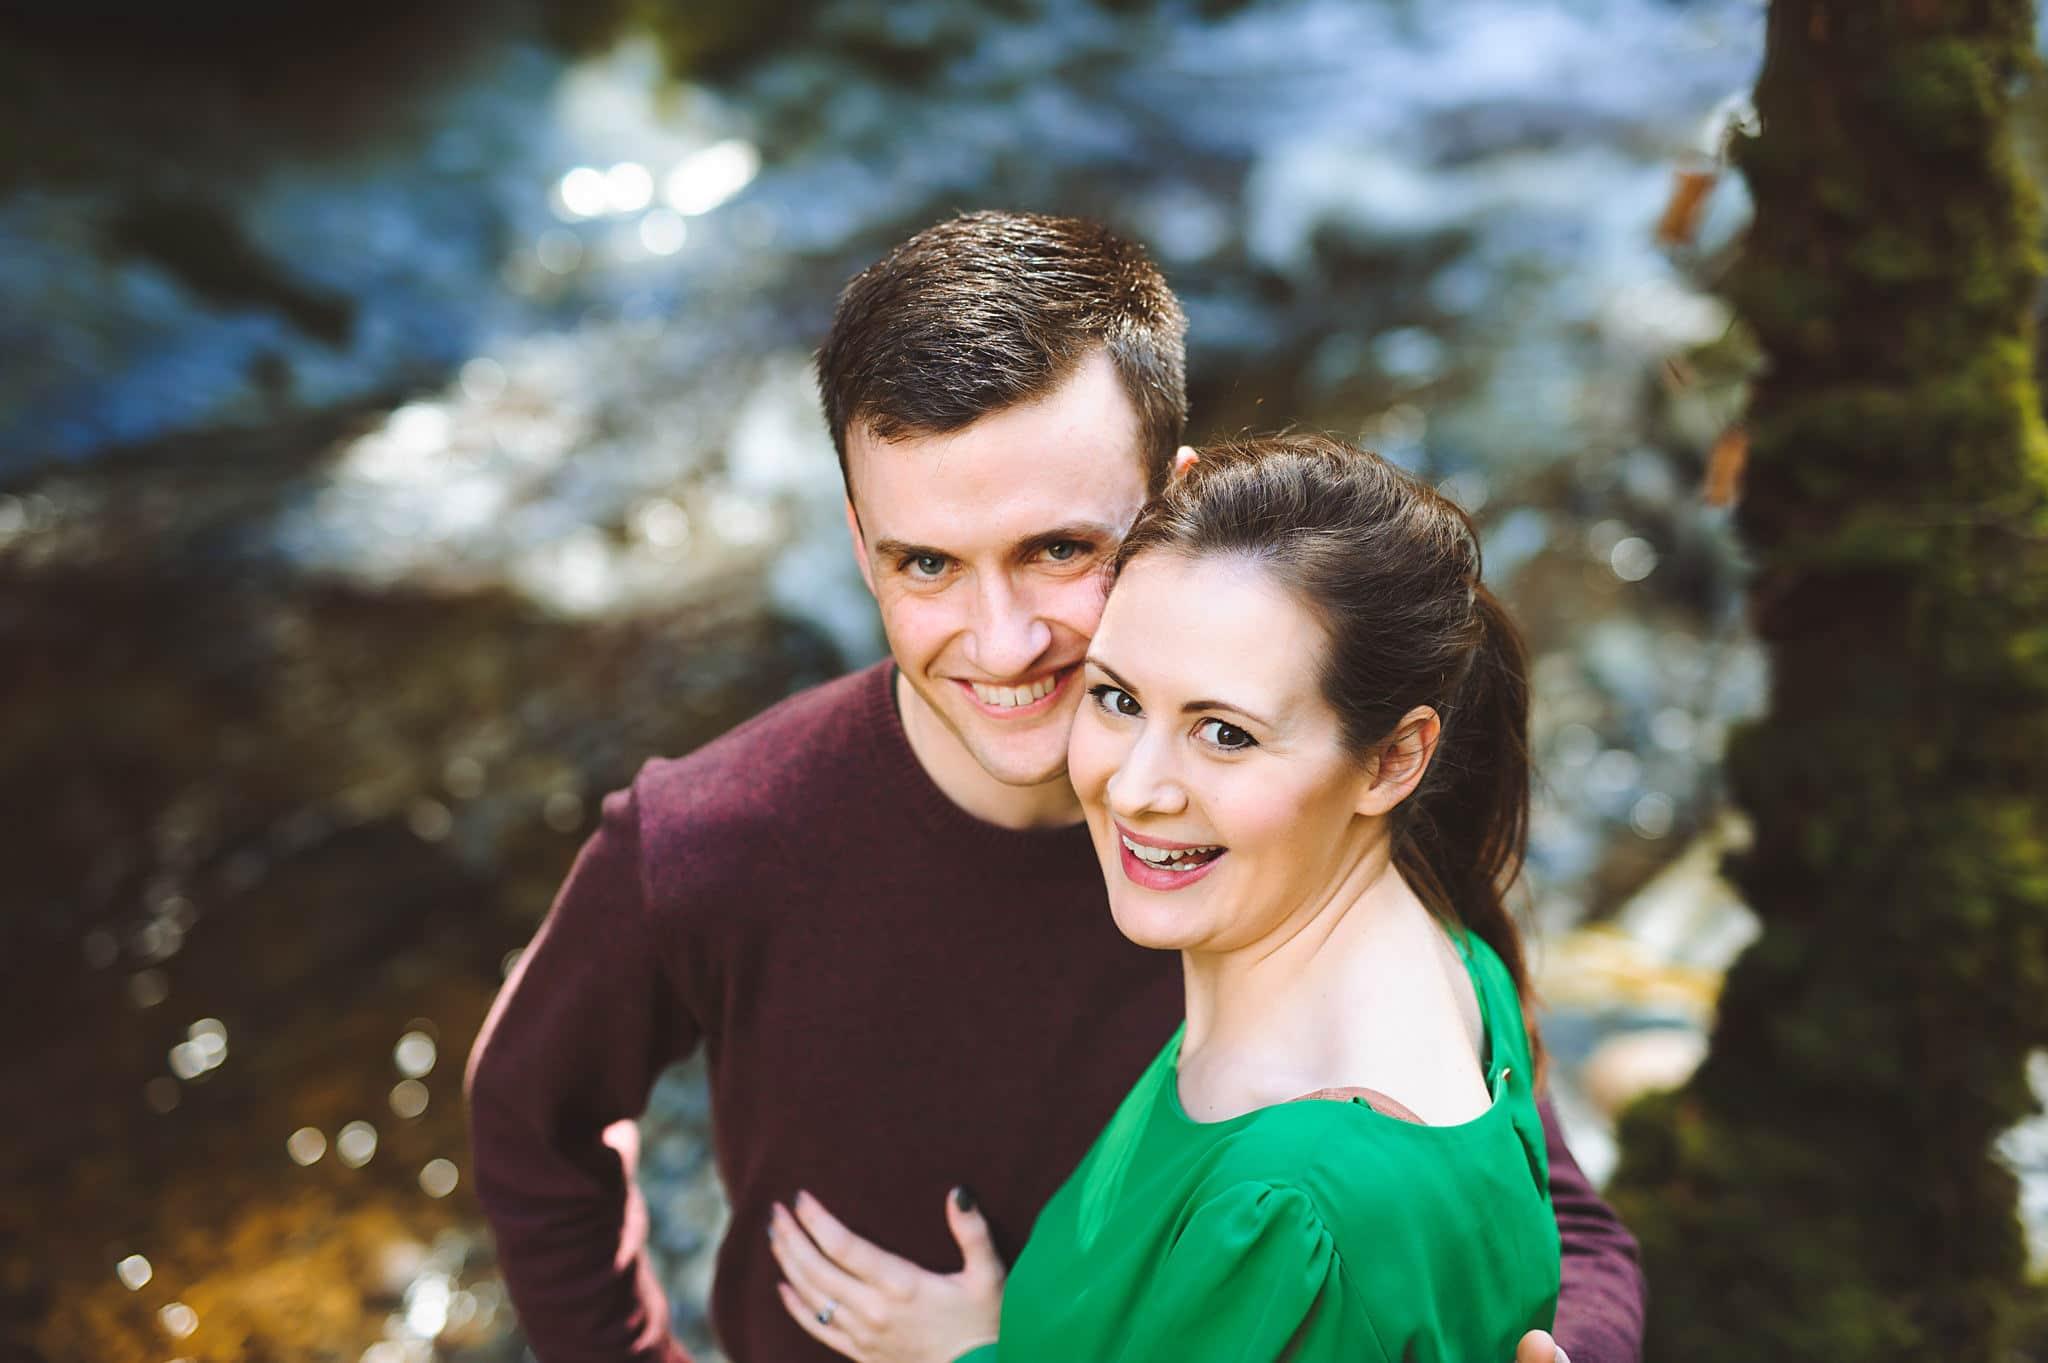 wedding-photographer-aberystwyth-wales (10)